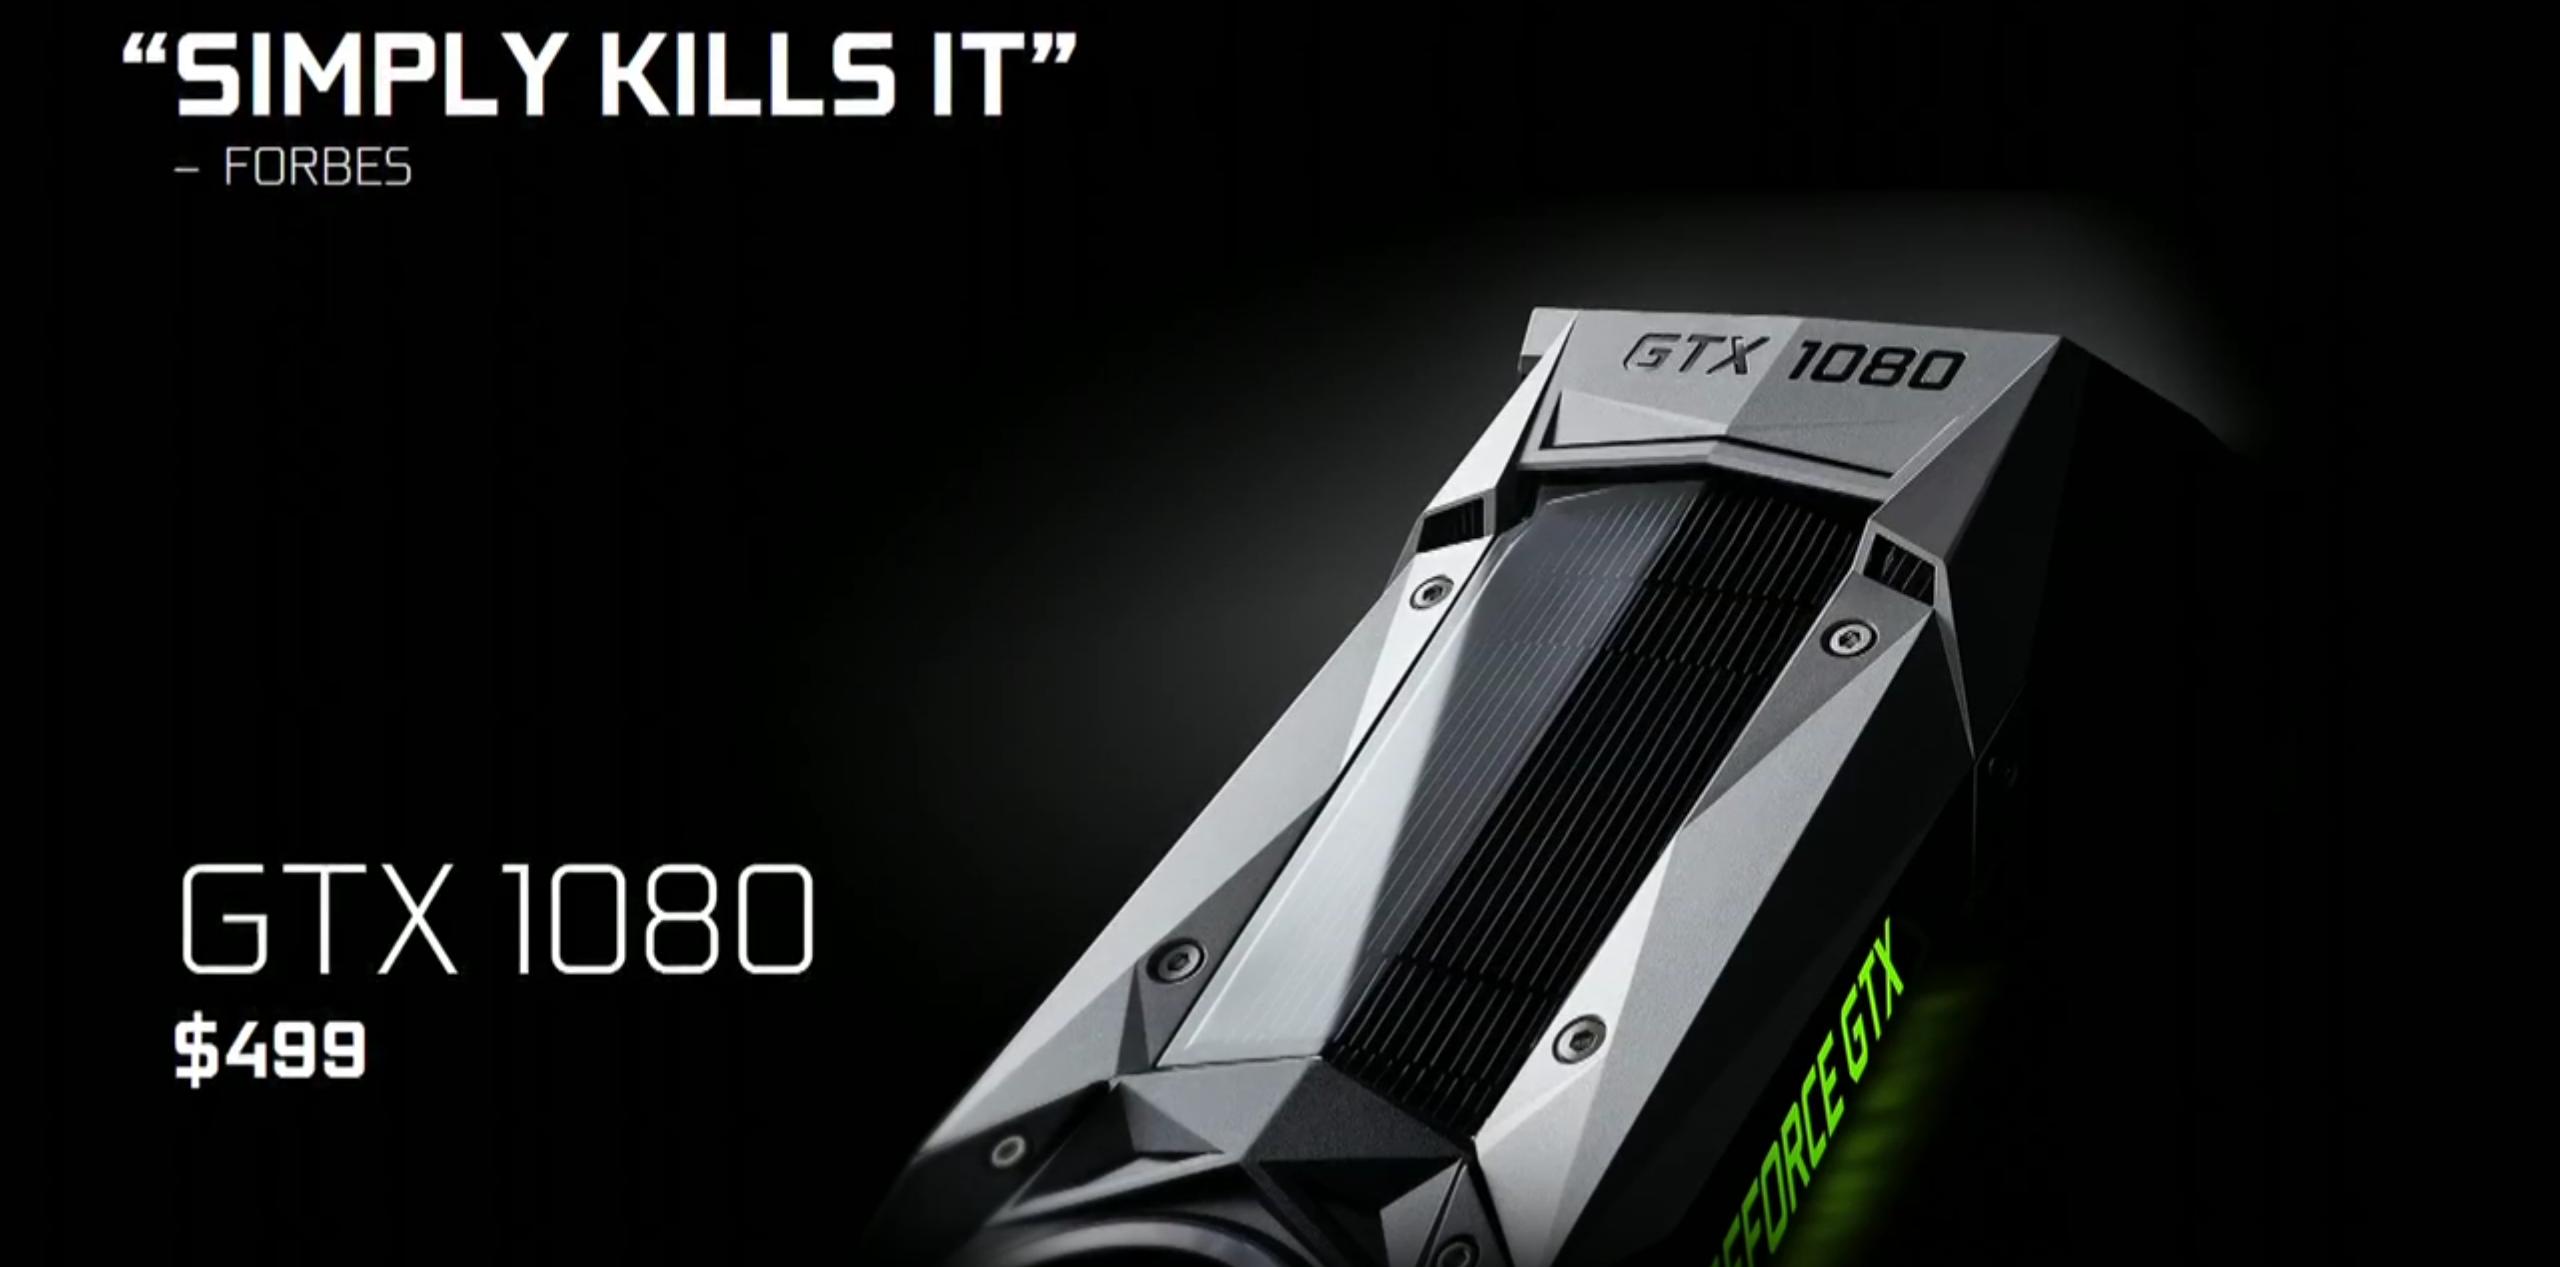 NVIDIA GeForce GTX 1080, GTX 1070, GTX 1060 Get Price Cuts